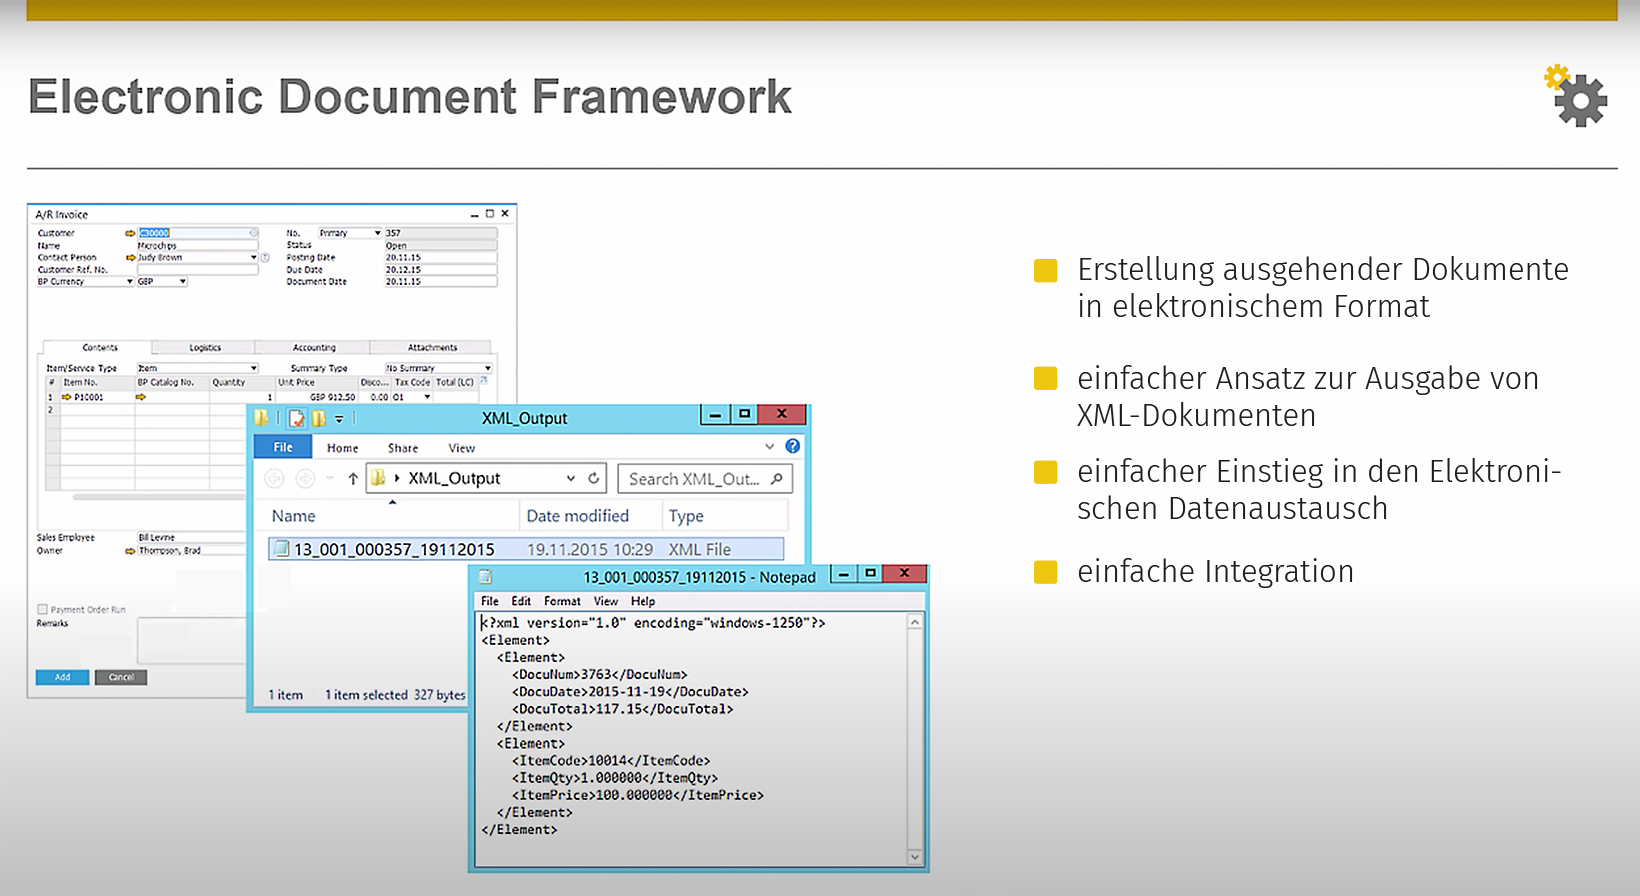 ElectronicDocumentFramework-SAP